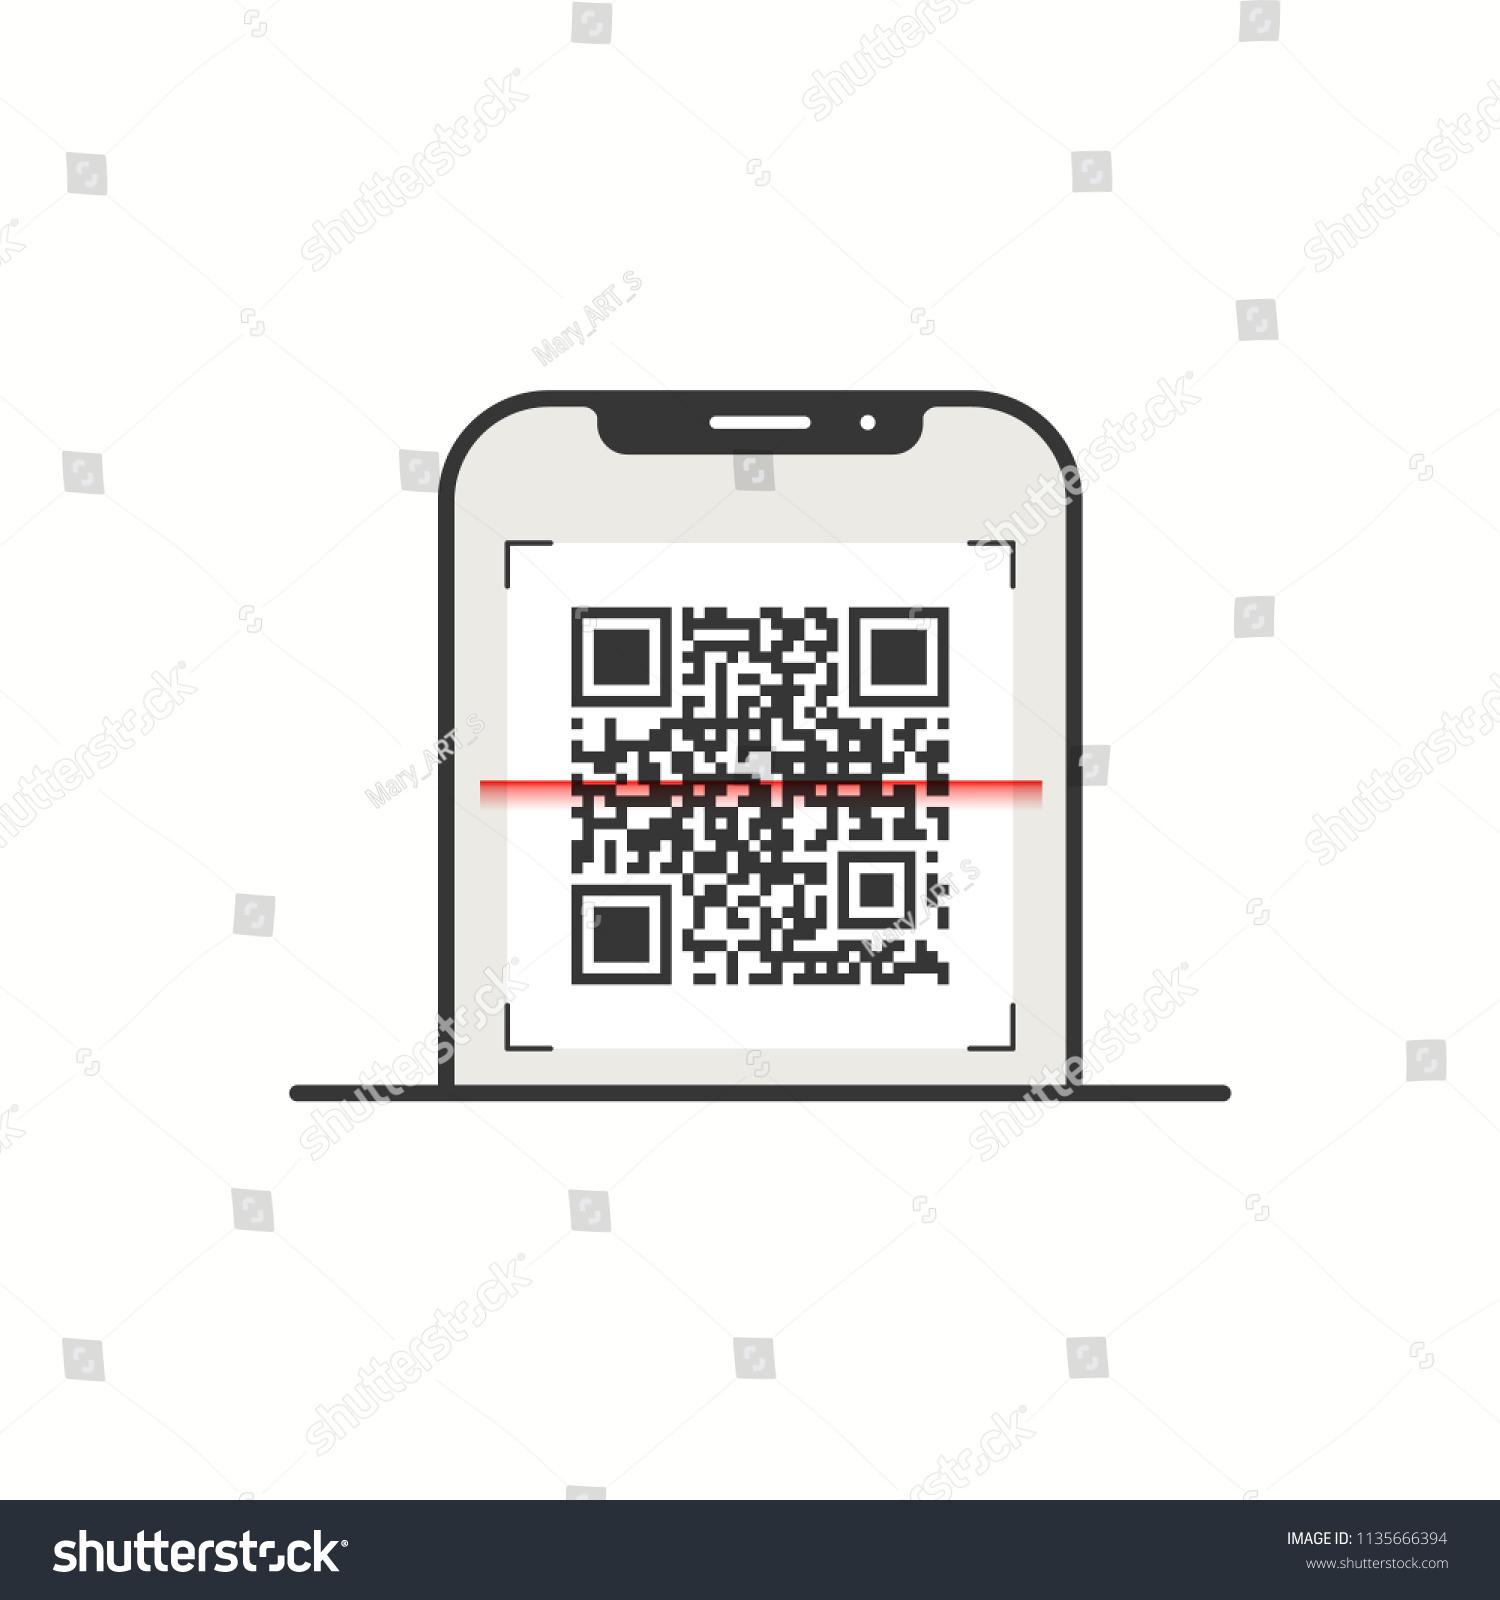 Scanning Qr Code Mobile Phone Symbol Stock Photo Photo Vector